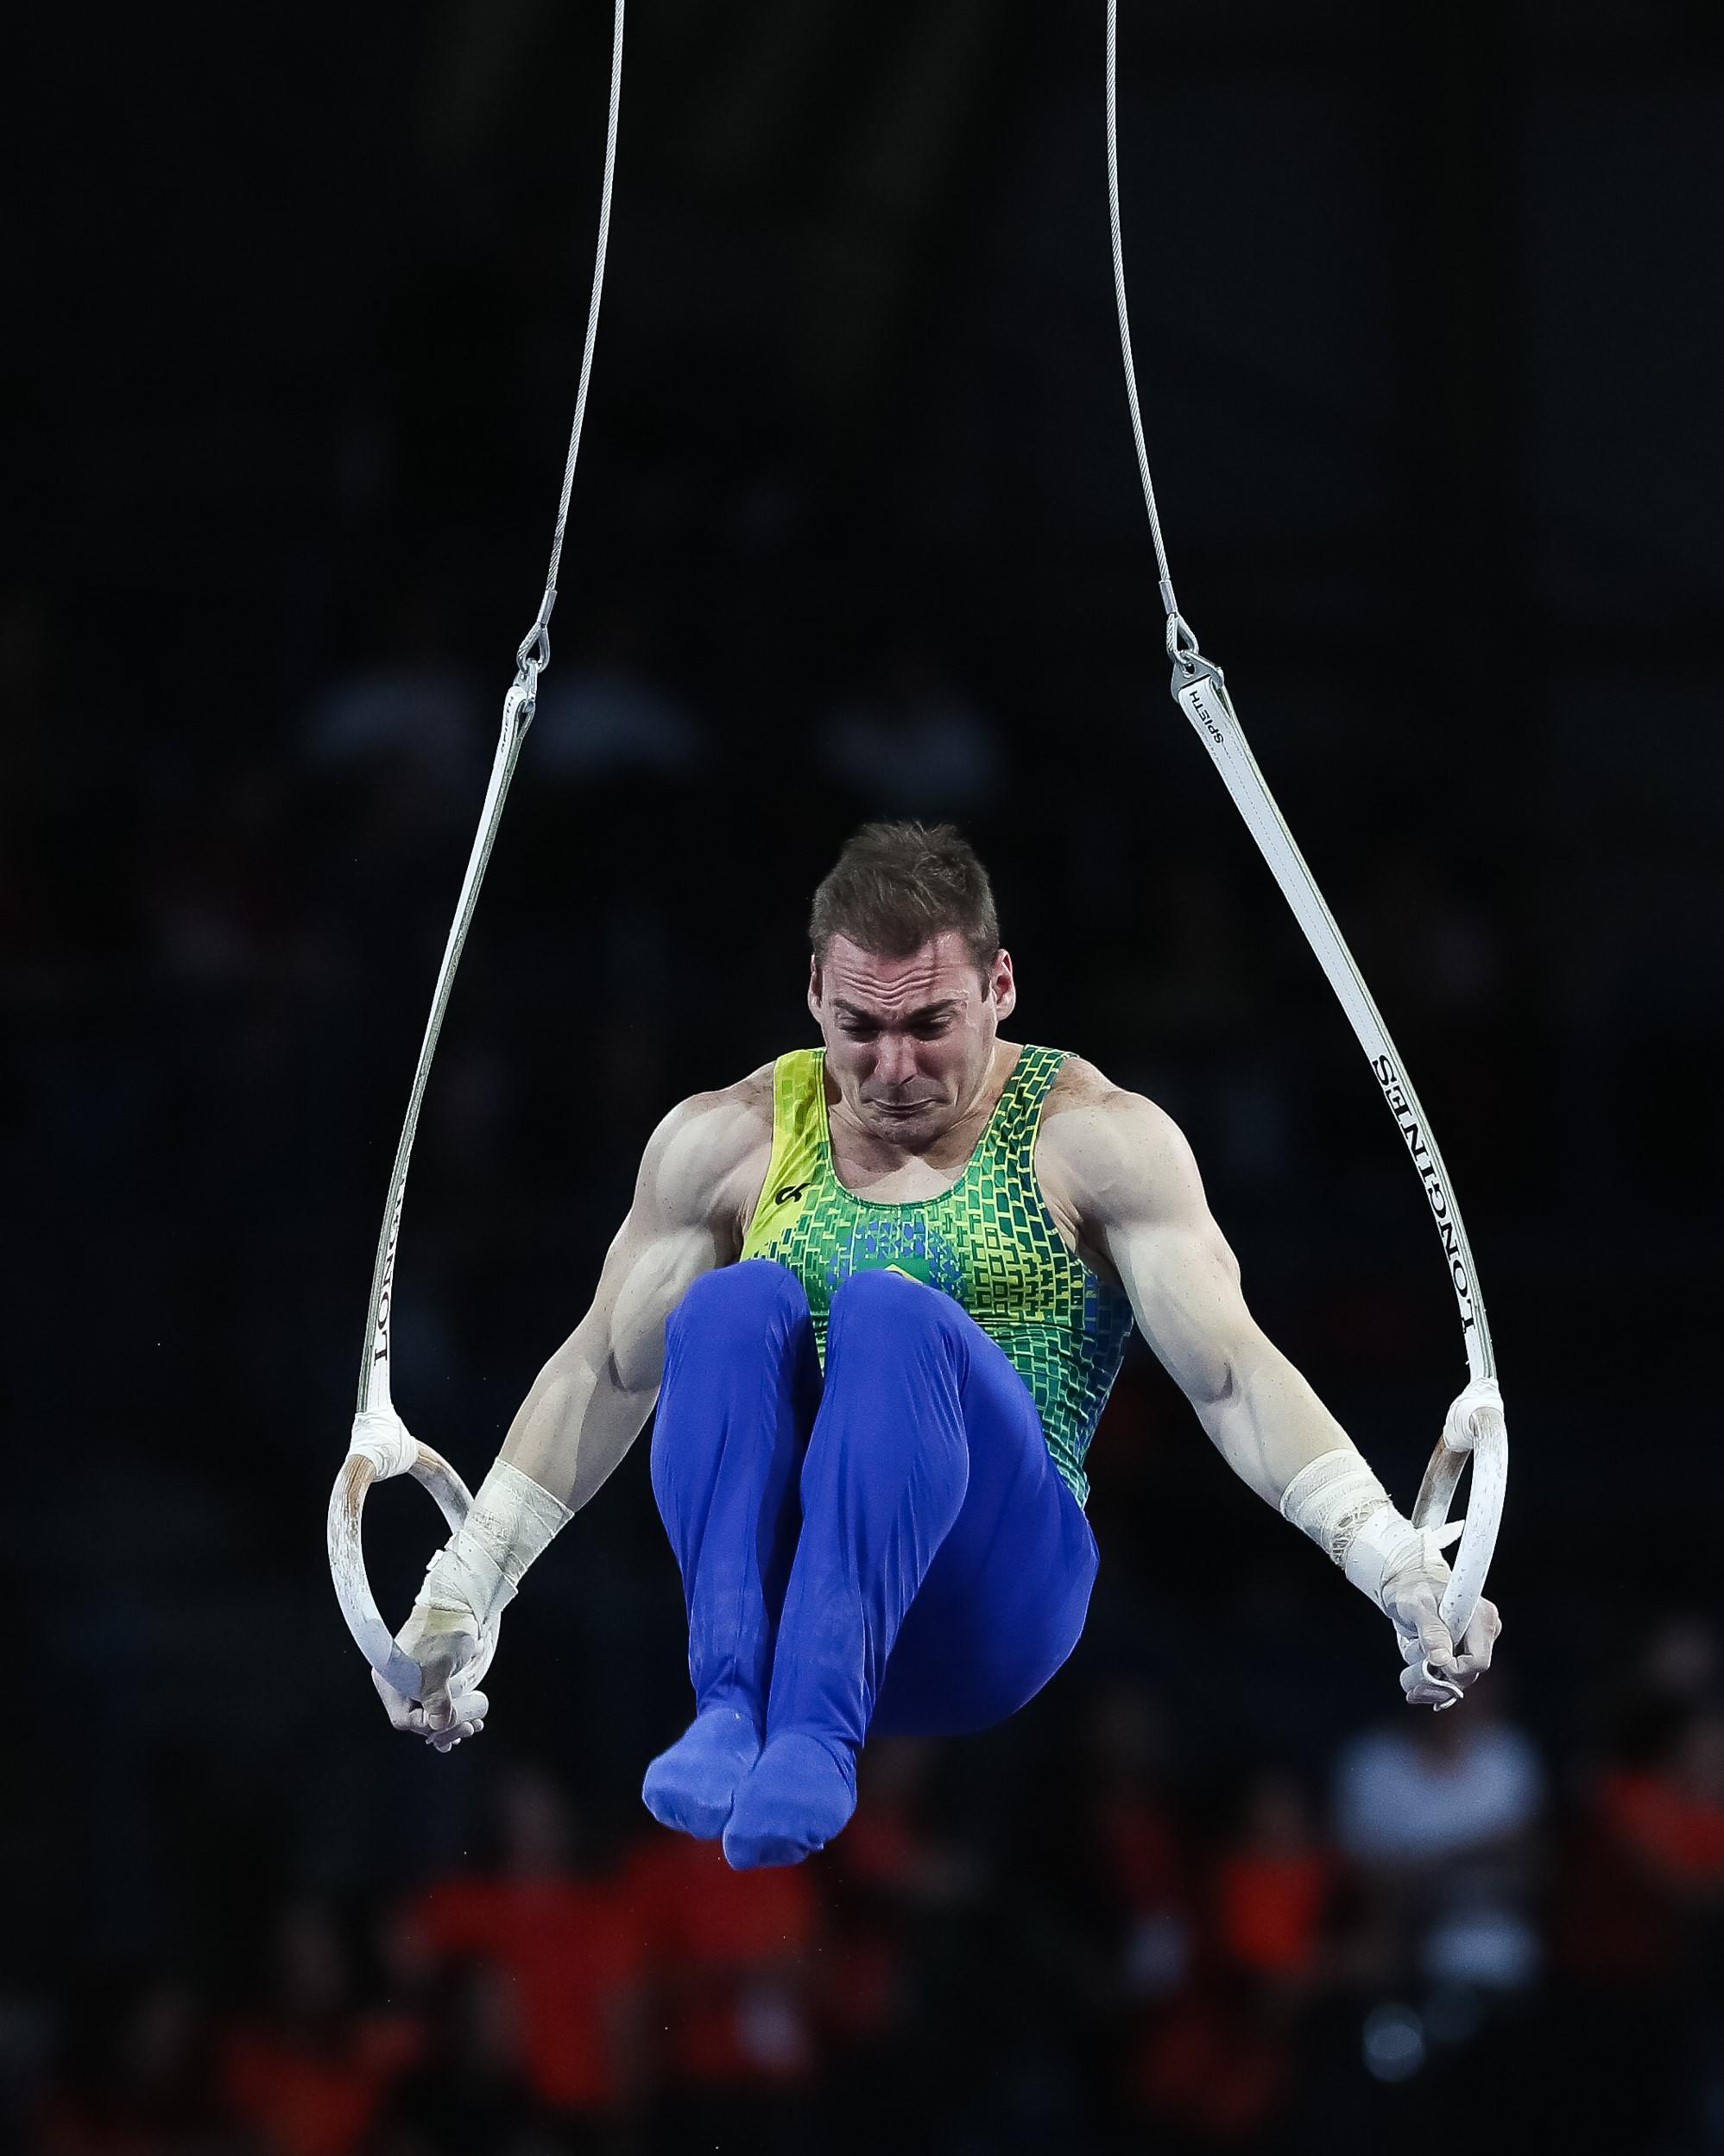 FIG Artistic Gymnastics World Championships   Oct2019   Hanns-Martin-Schleyer-Halle Arena, Stuttgart, Germany   Photo: Ricardo Bufolin / Panamerica Press / CBG